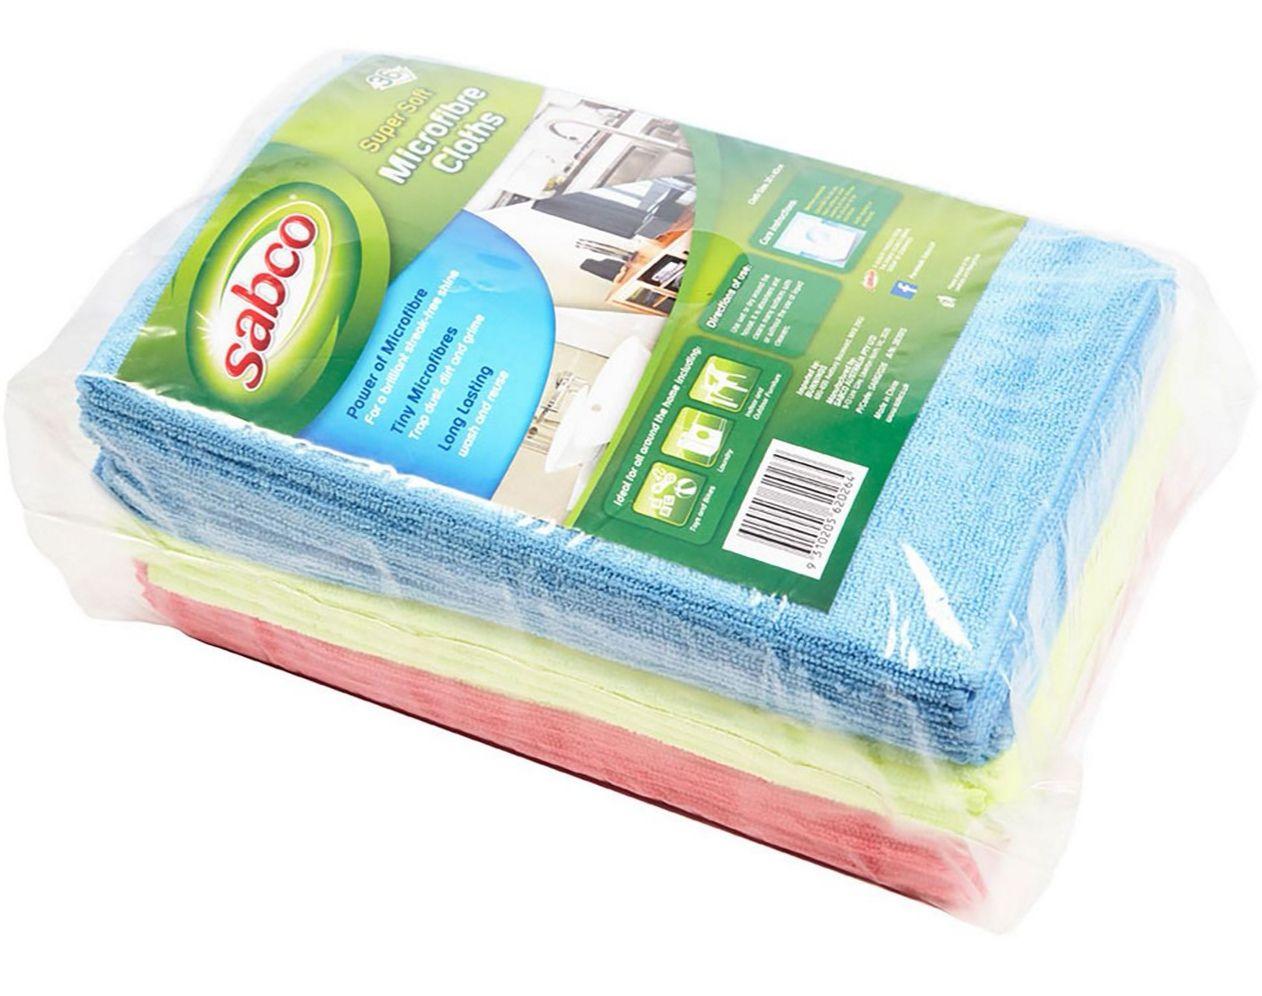 Sabco Microfibre Cloths - 36 Pack For £6.48 @ Homebase